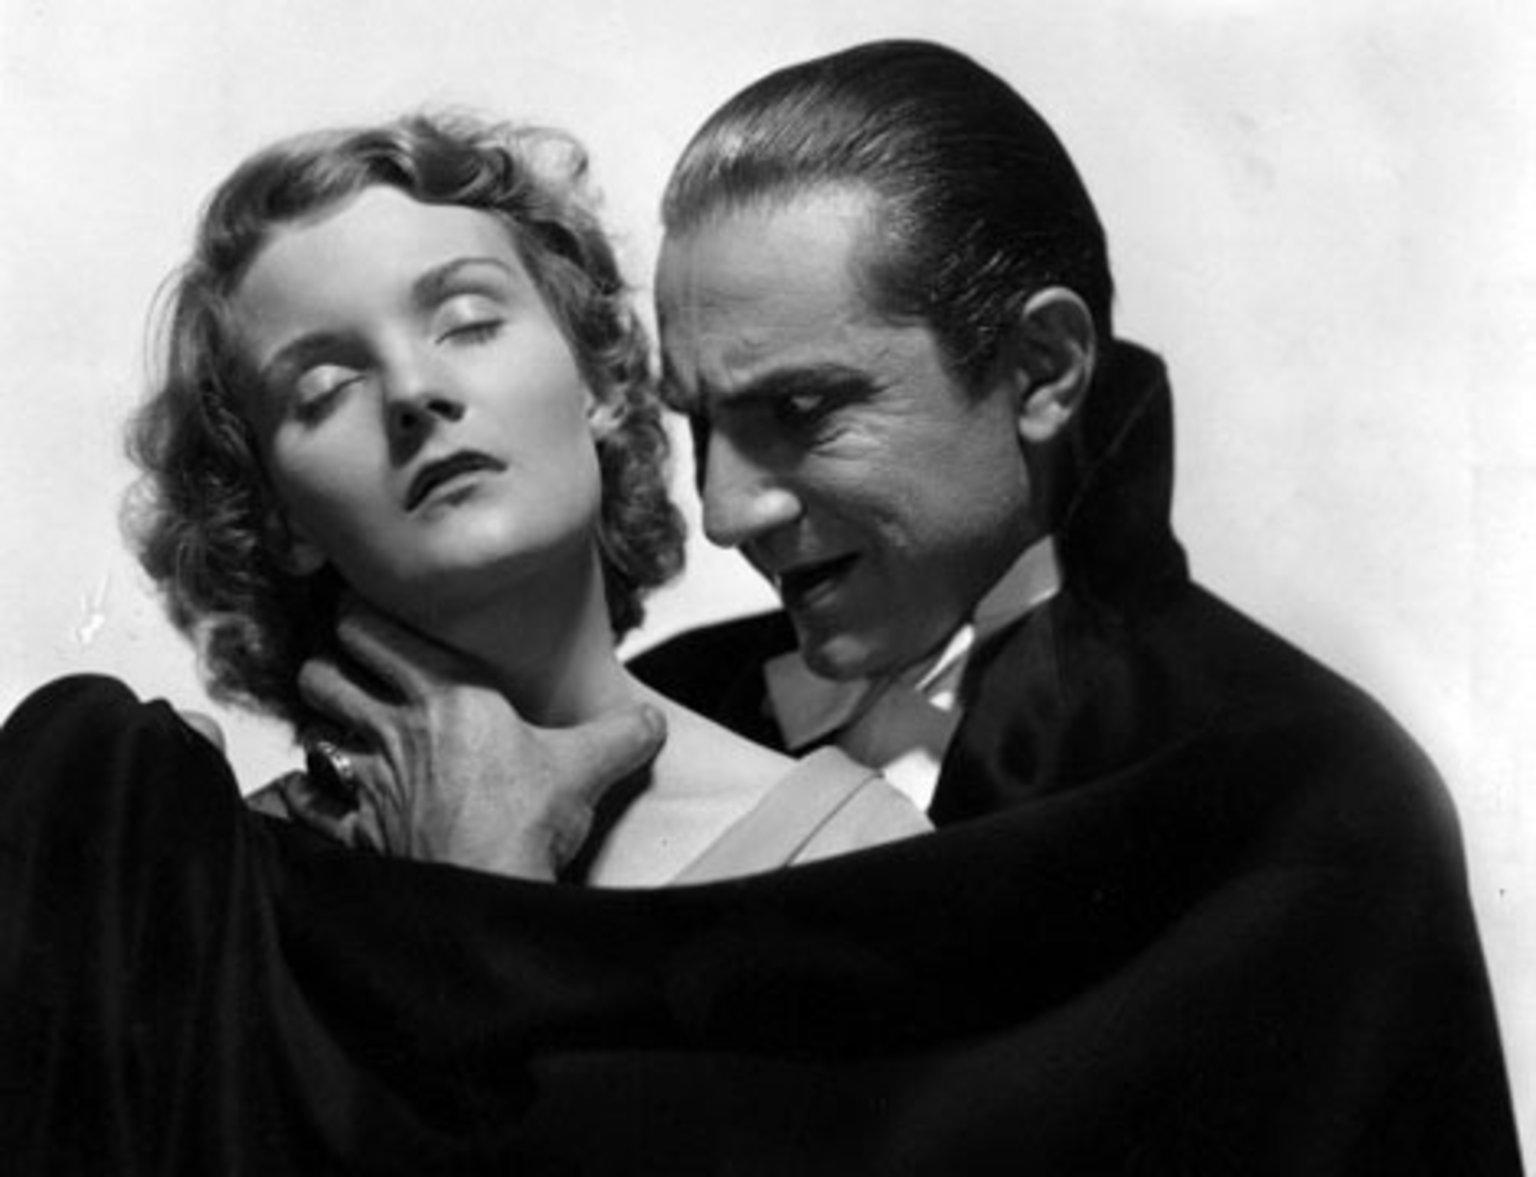 dracula, helen chandler, bela lugosi, classic horror movies